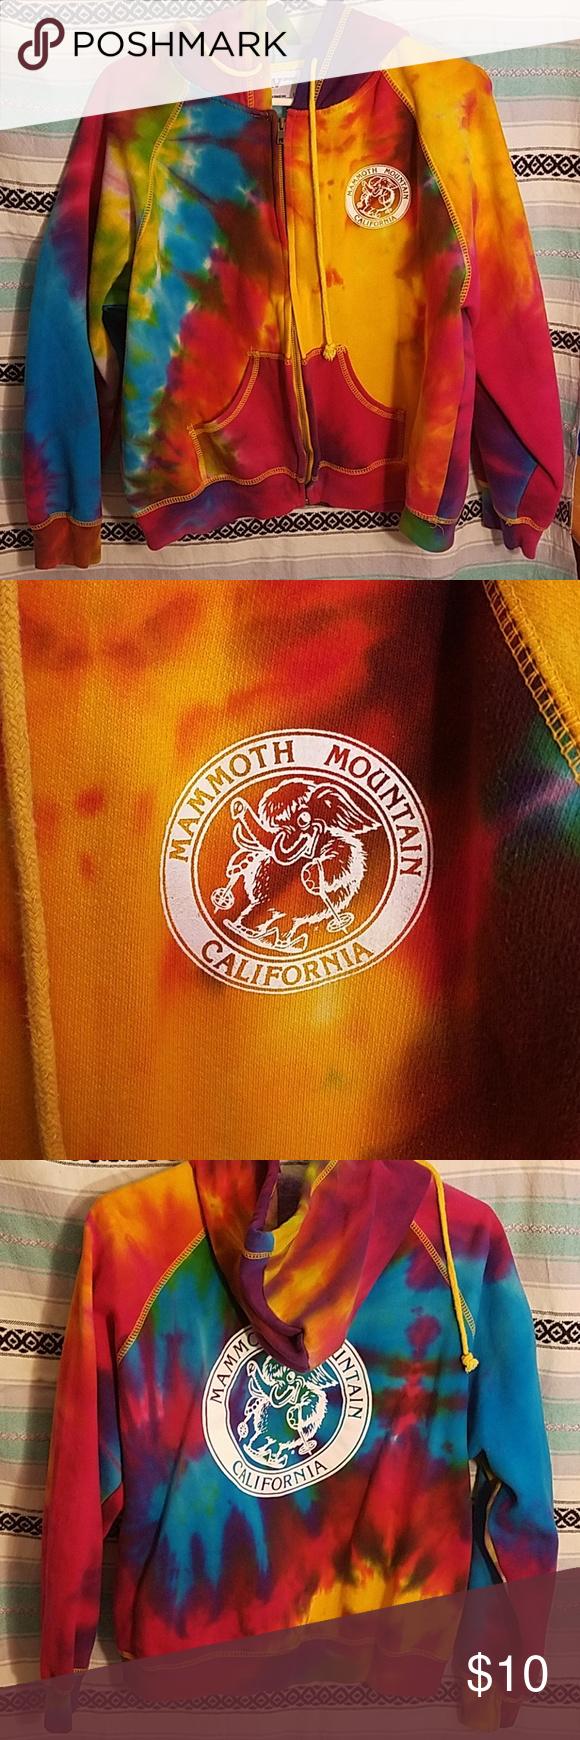 Mammoth Mountain California Tie Dye Sweatshirt Tie Dye Sweatshirt Line Jackets Tie Dye [ 1740 x 580 Pixel ]